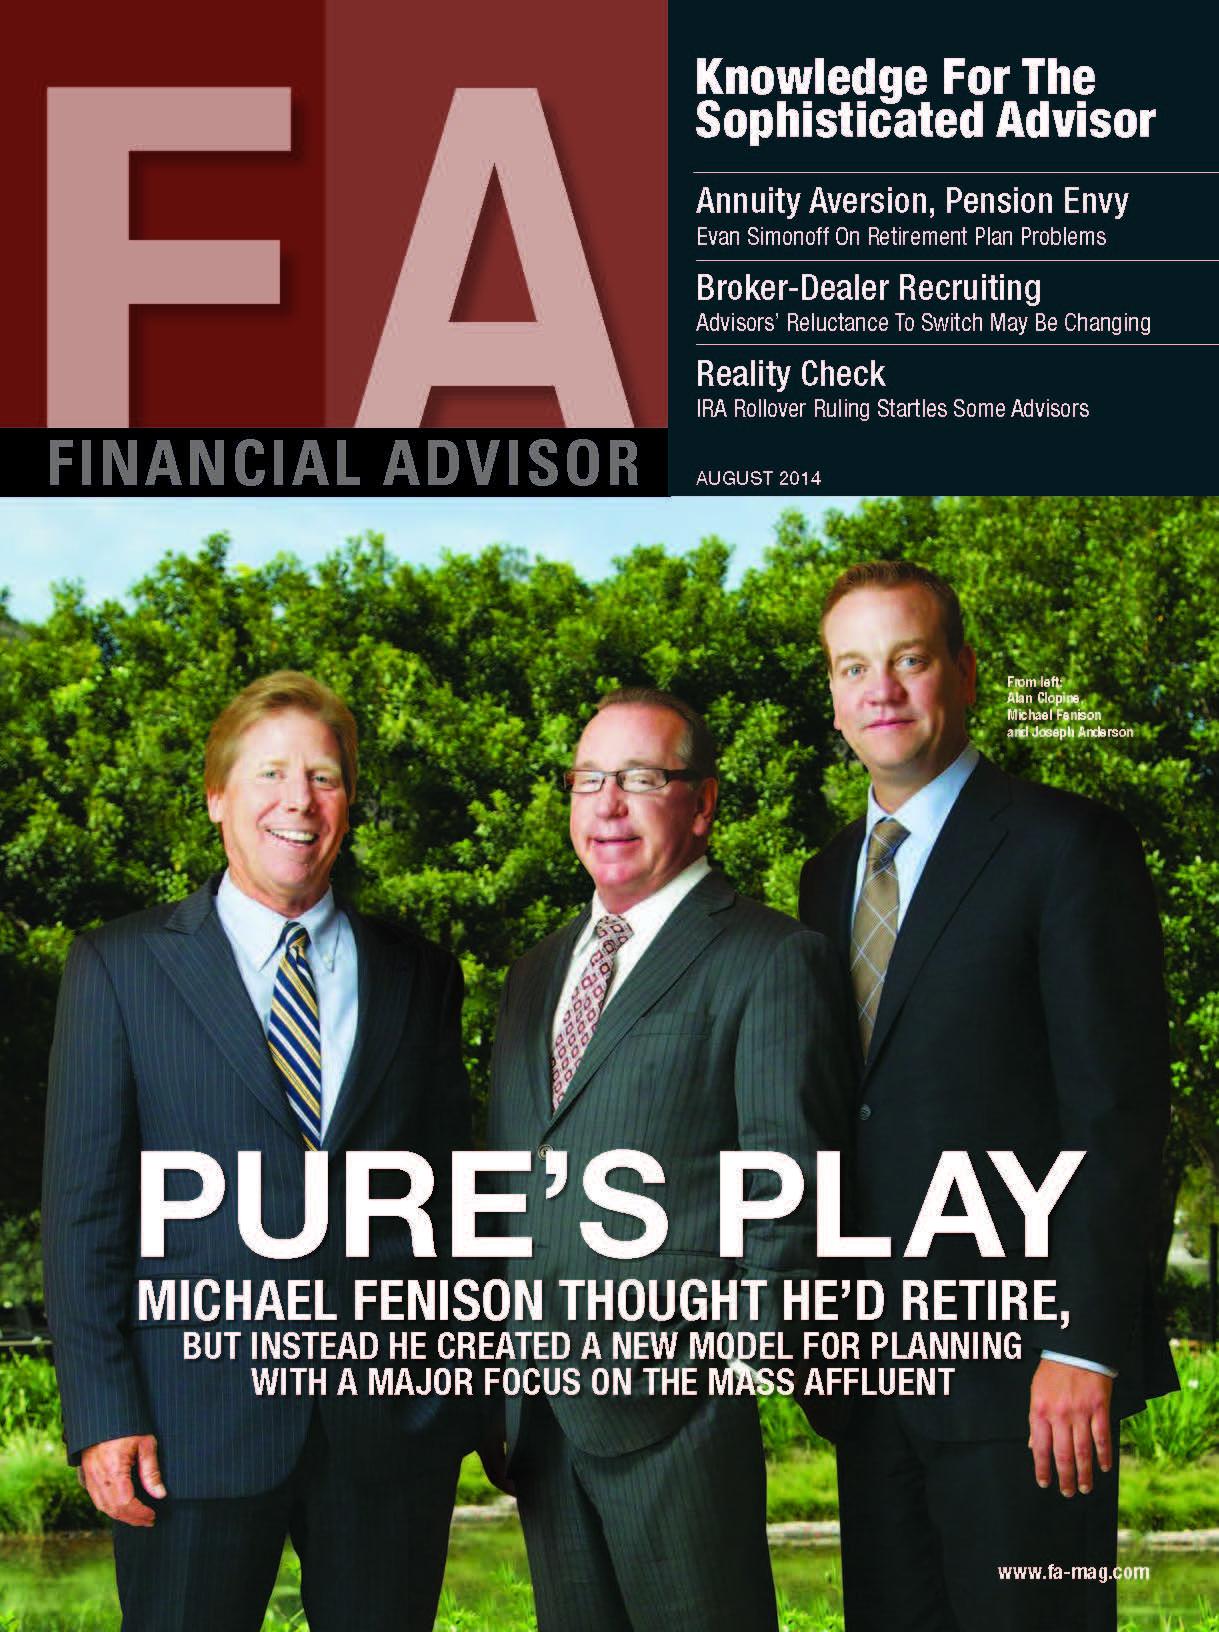 0814_PuresPlay_PureFinancial_FAMagazine unlocked (2)_Page_1